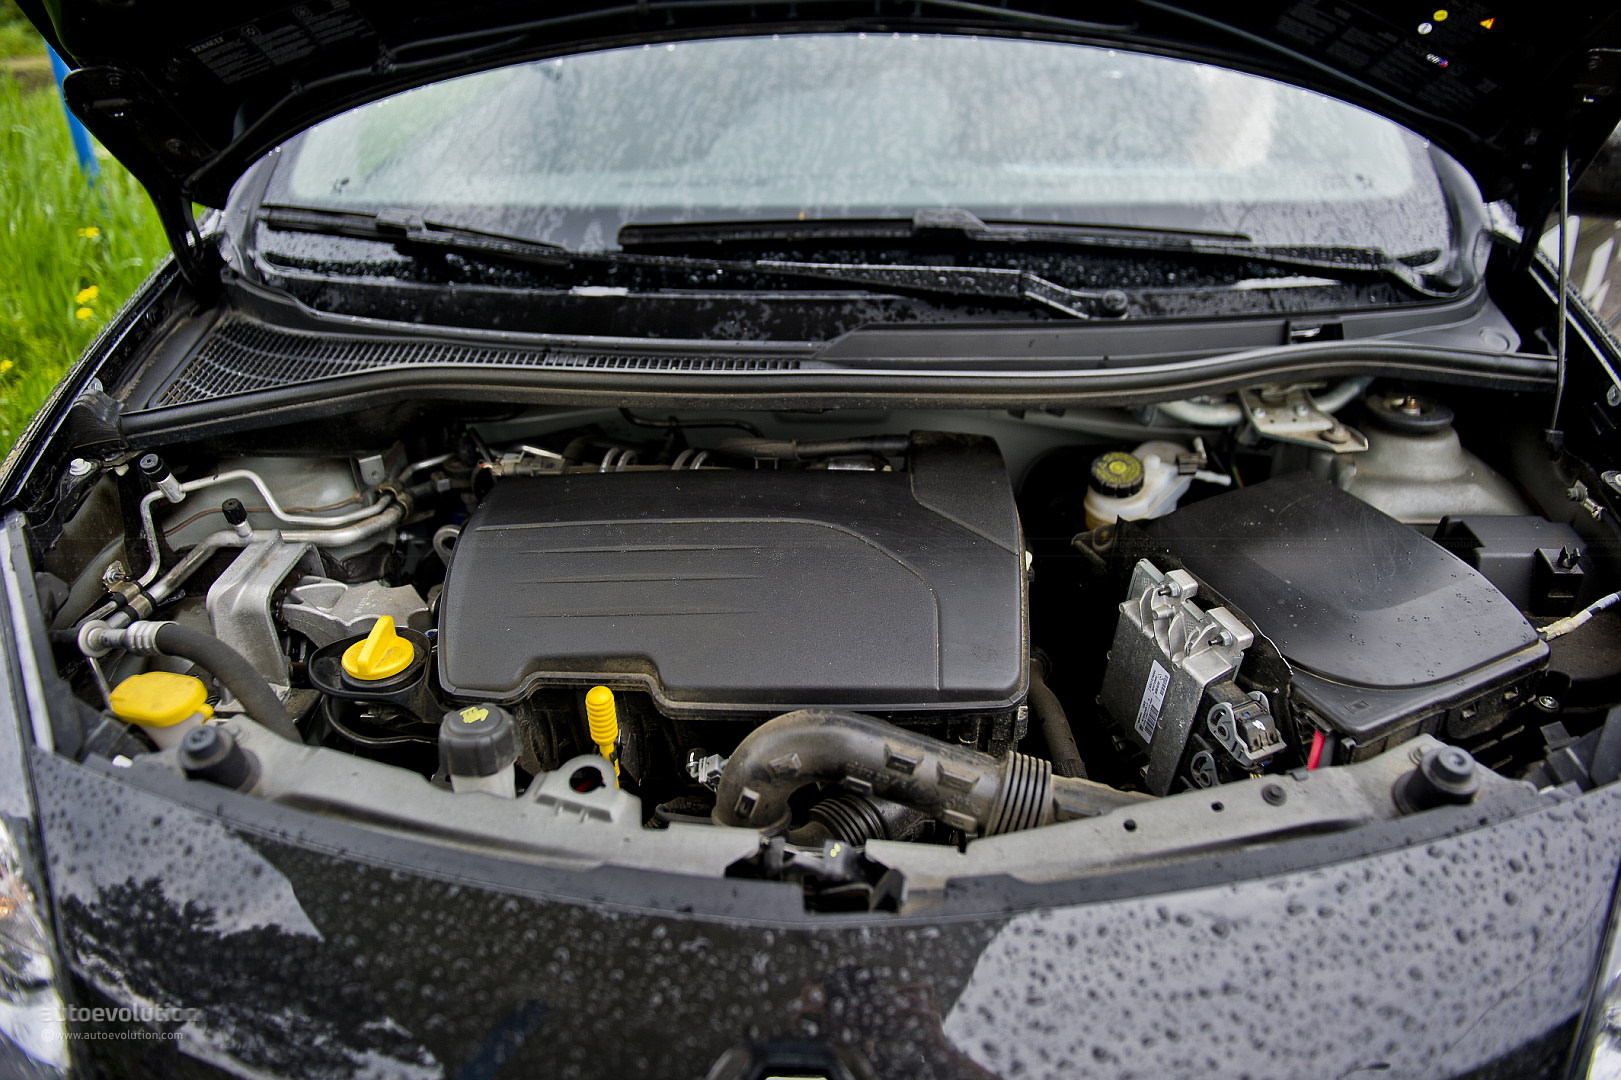 RENAULT TWINGO 1.2 engine